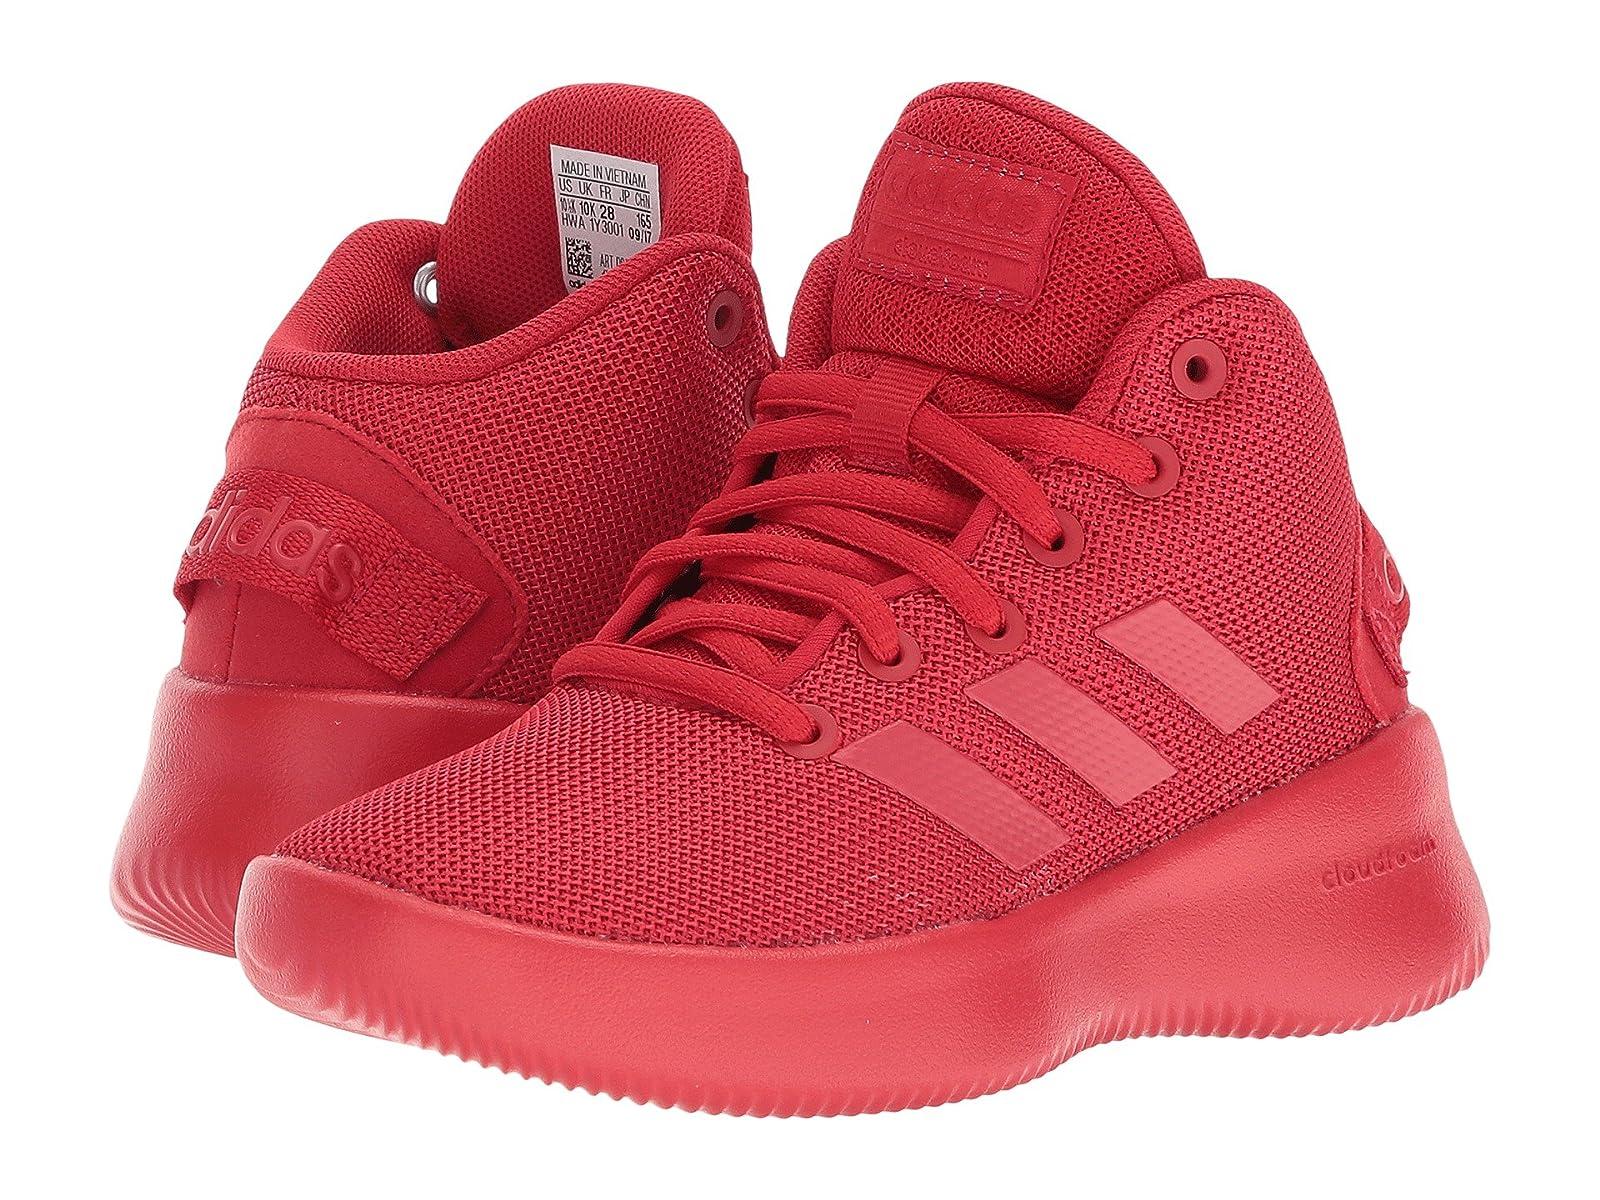 adidas Kids Cloudfoam Refresh Mid (Little Kid/Big Kid)Stylish and characteristic shoes